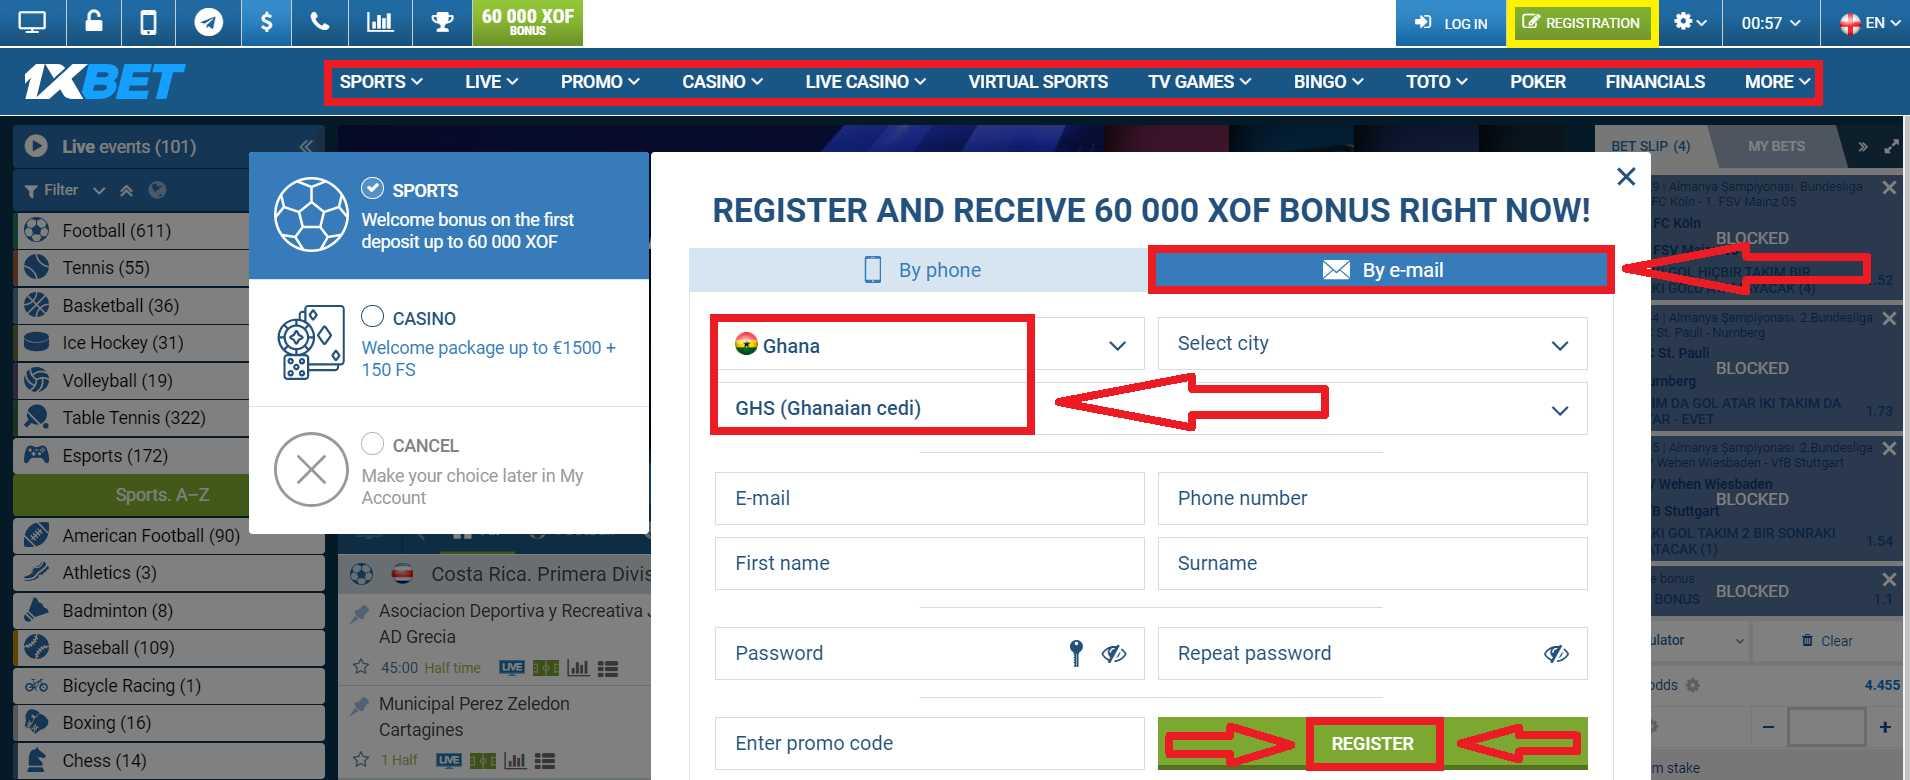 1xBet Promo Code for Registration